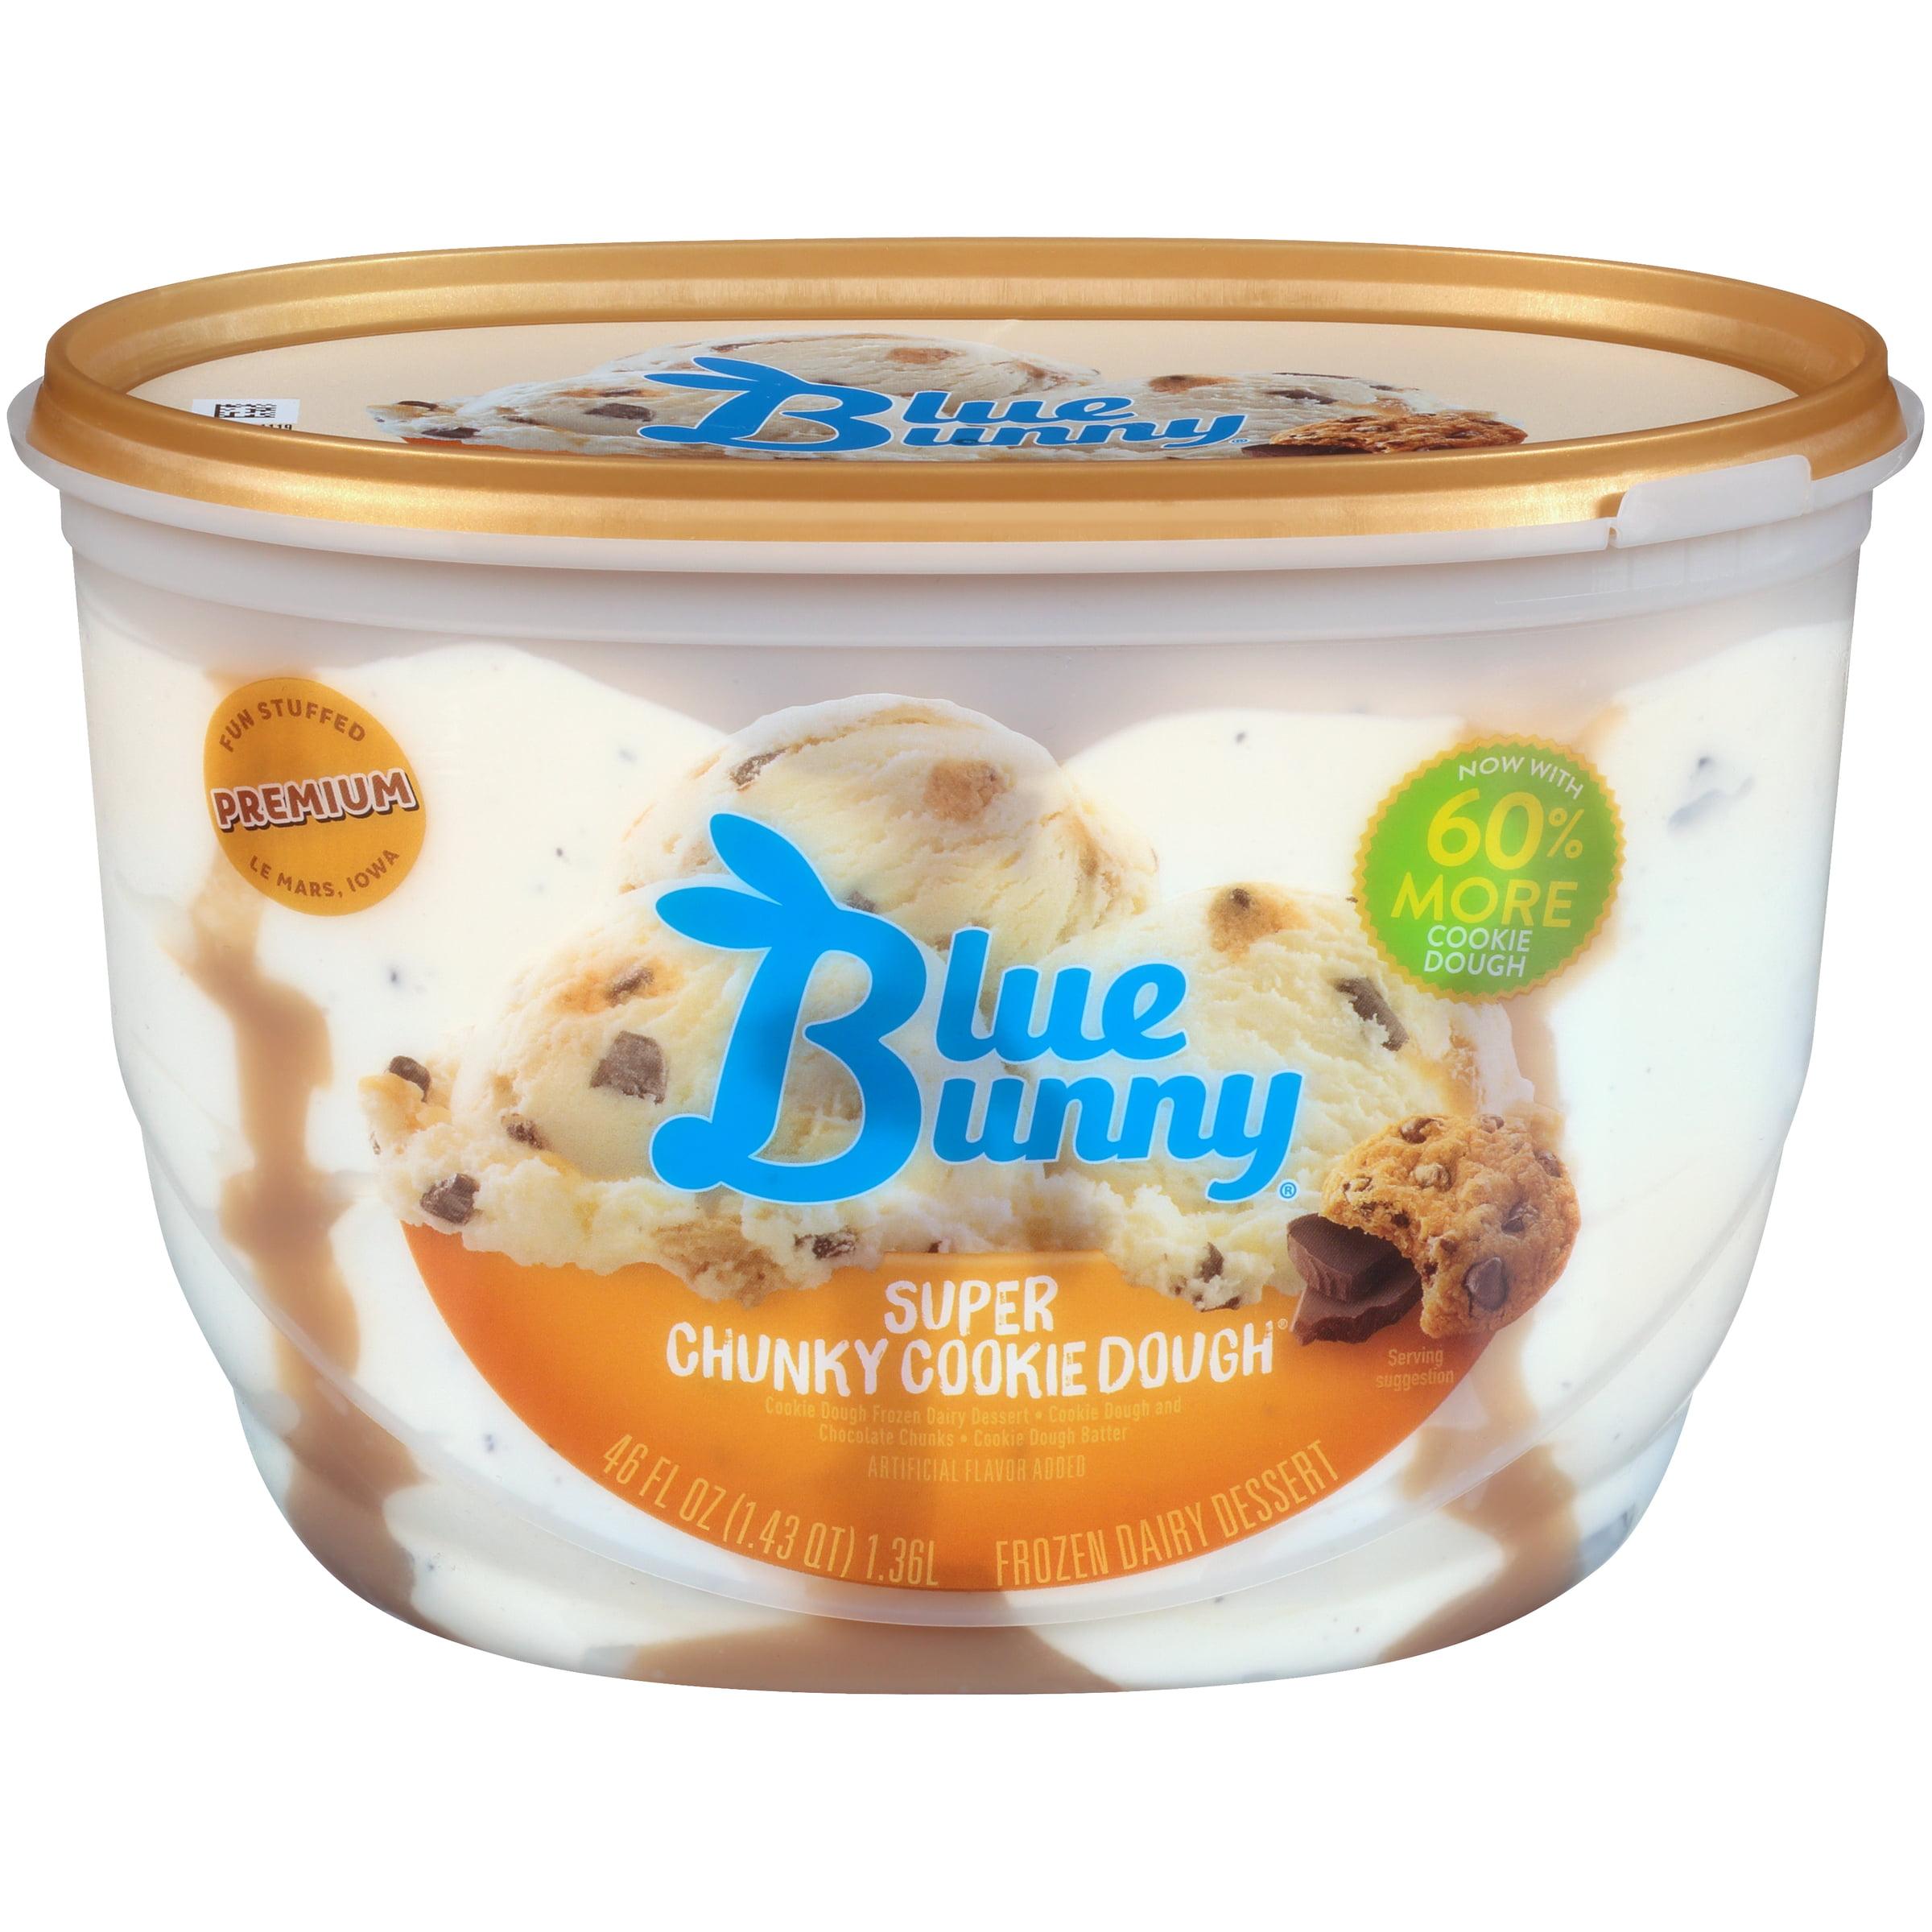 Pleasing Blue Bunny Super Chunky Cookie Dough Walmart Com Walmart Com Funny Birthday Cards Online Inifodamsfinfo